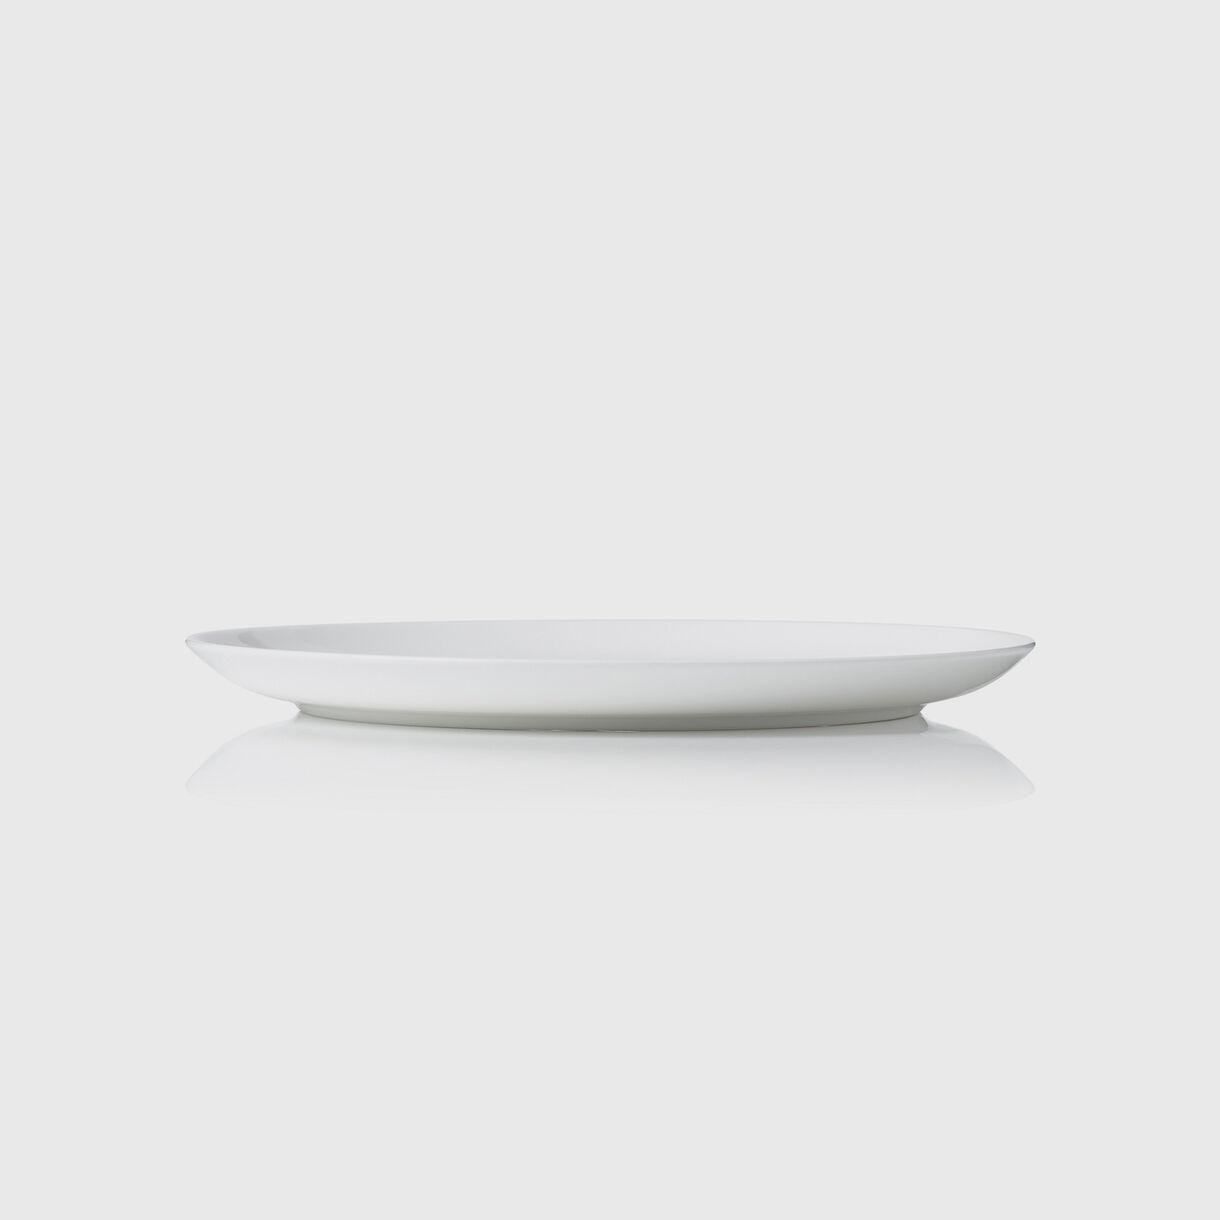 David Caon by Noritake Entree Plate